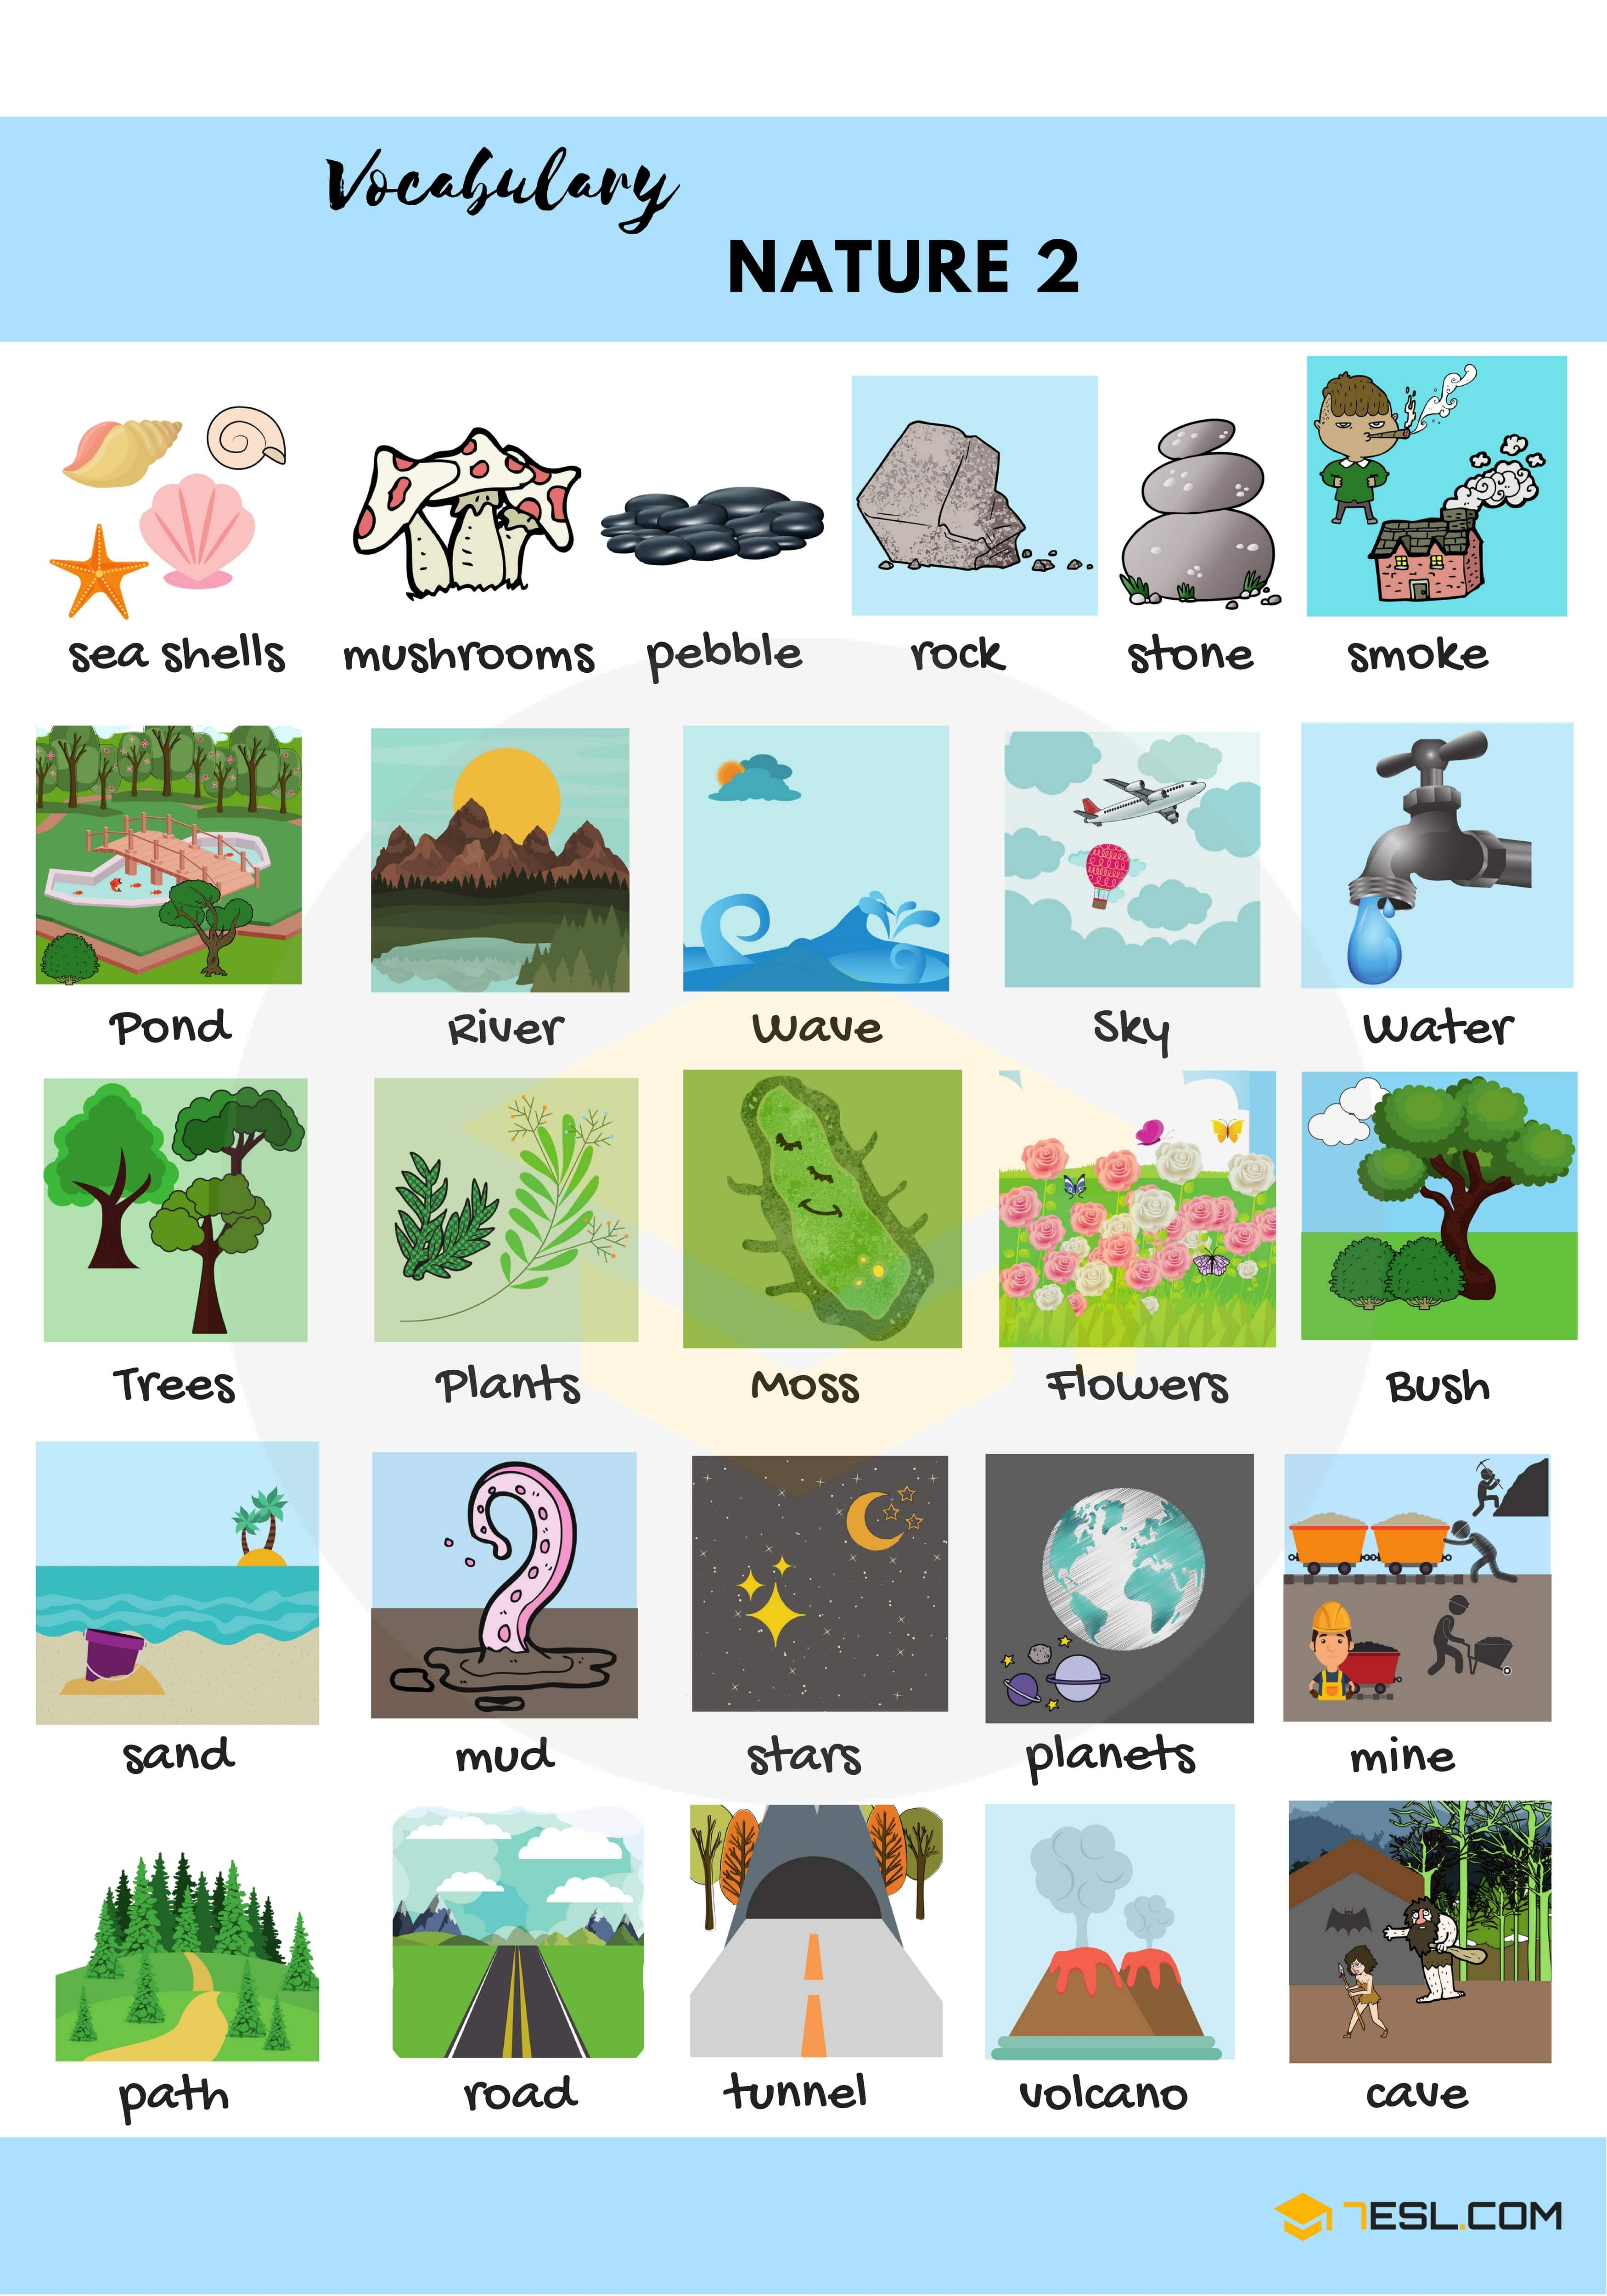 nature vocabulary in english cambridge cae english vocabulary vocabulary y learn english. Black Bedroom Furniture Sets. Home Design Ideas